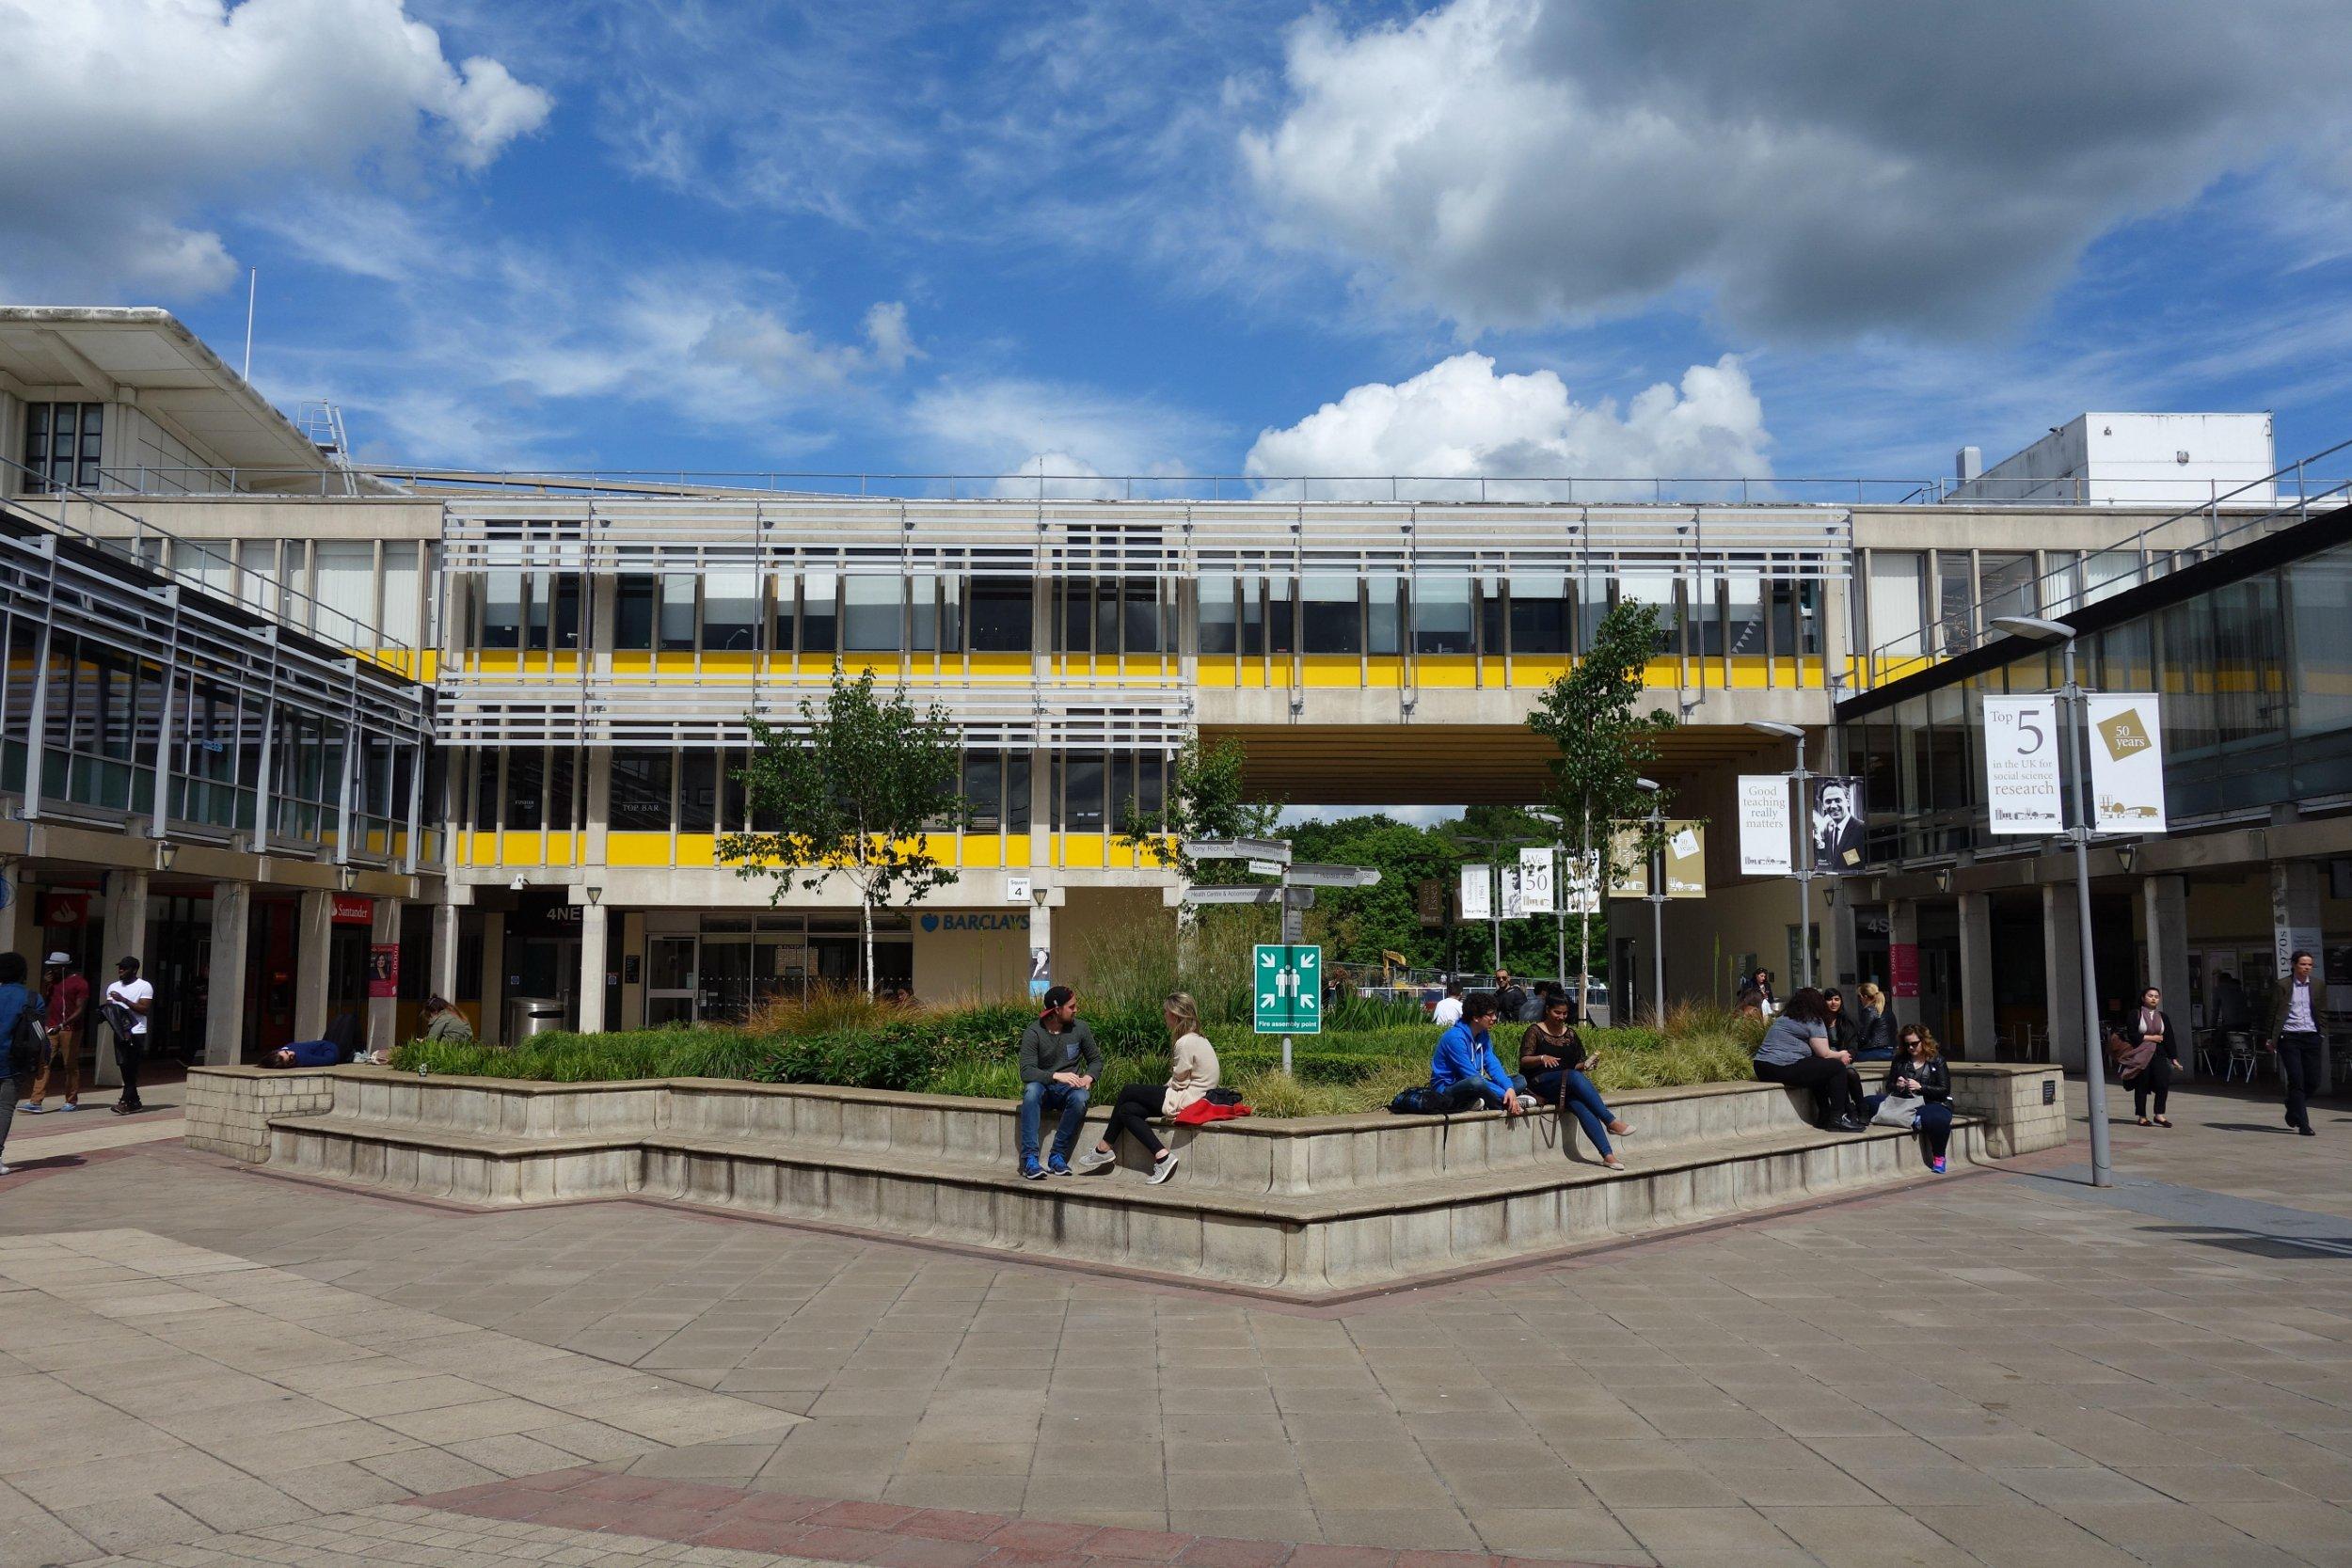 ERF09P Square 4 on University of Essex campus, Wivenhoe Park, Colchester, Essex